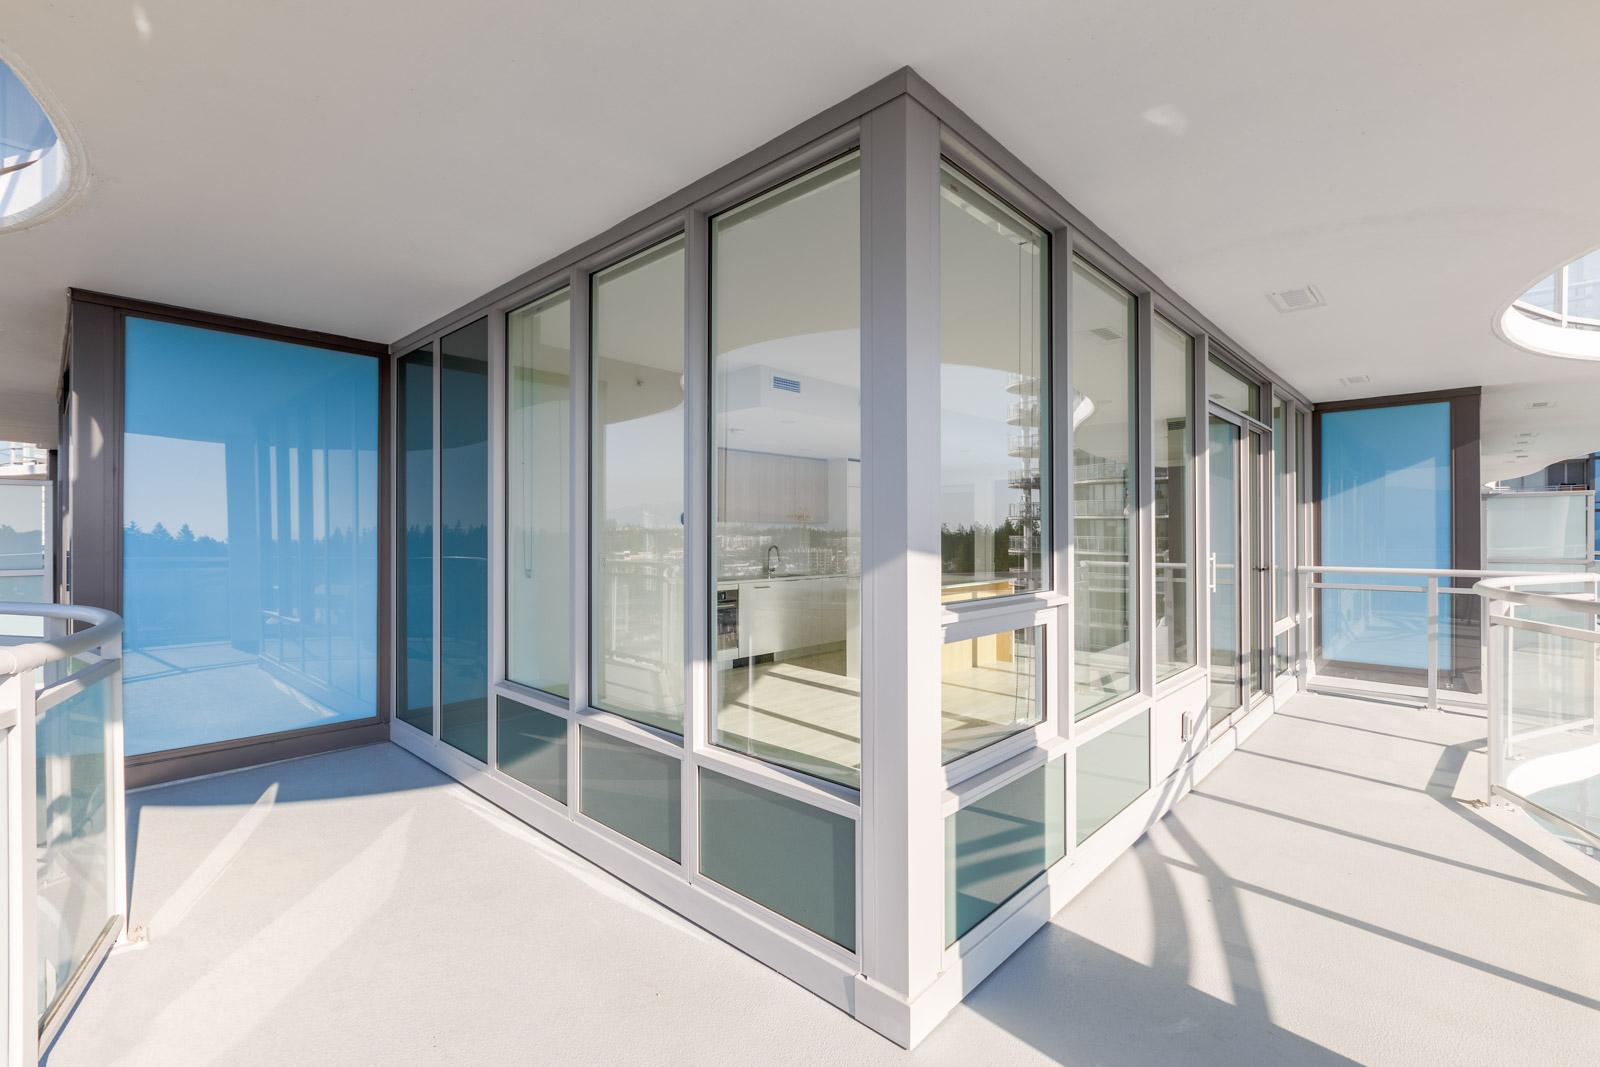 corner suite with windows